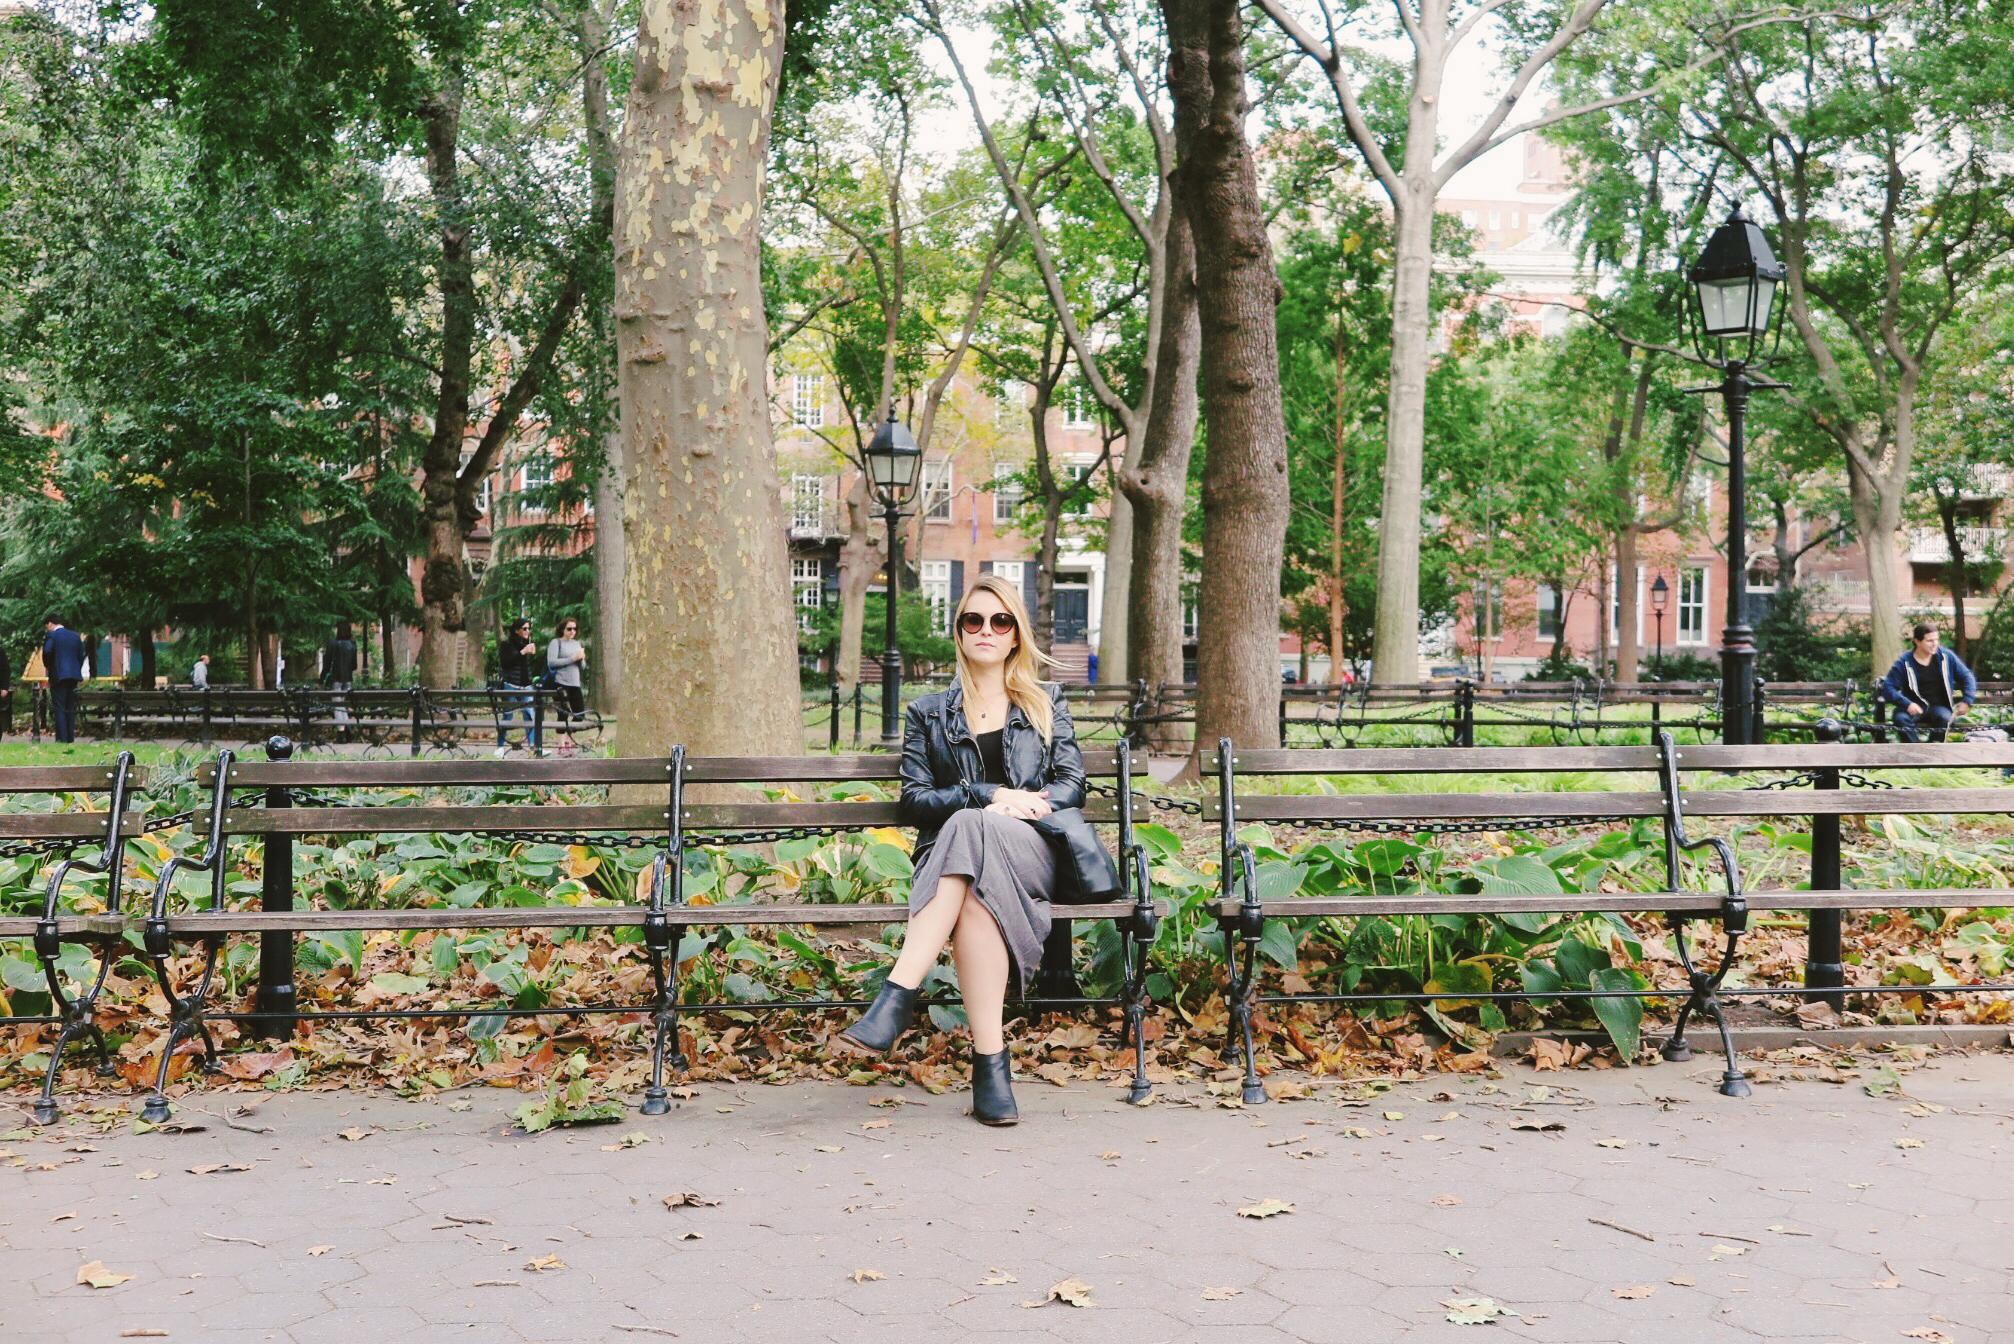 travel-green-new-york-city-washington-park-black-leather-jacket-gray-skirt-blonde-woman-park-bench.JPG